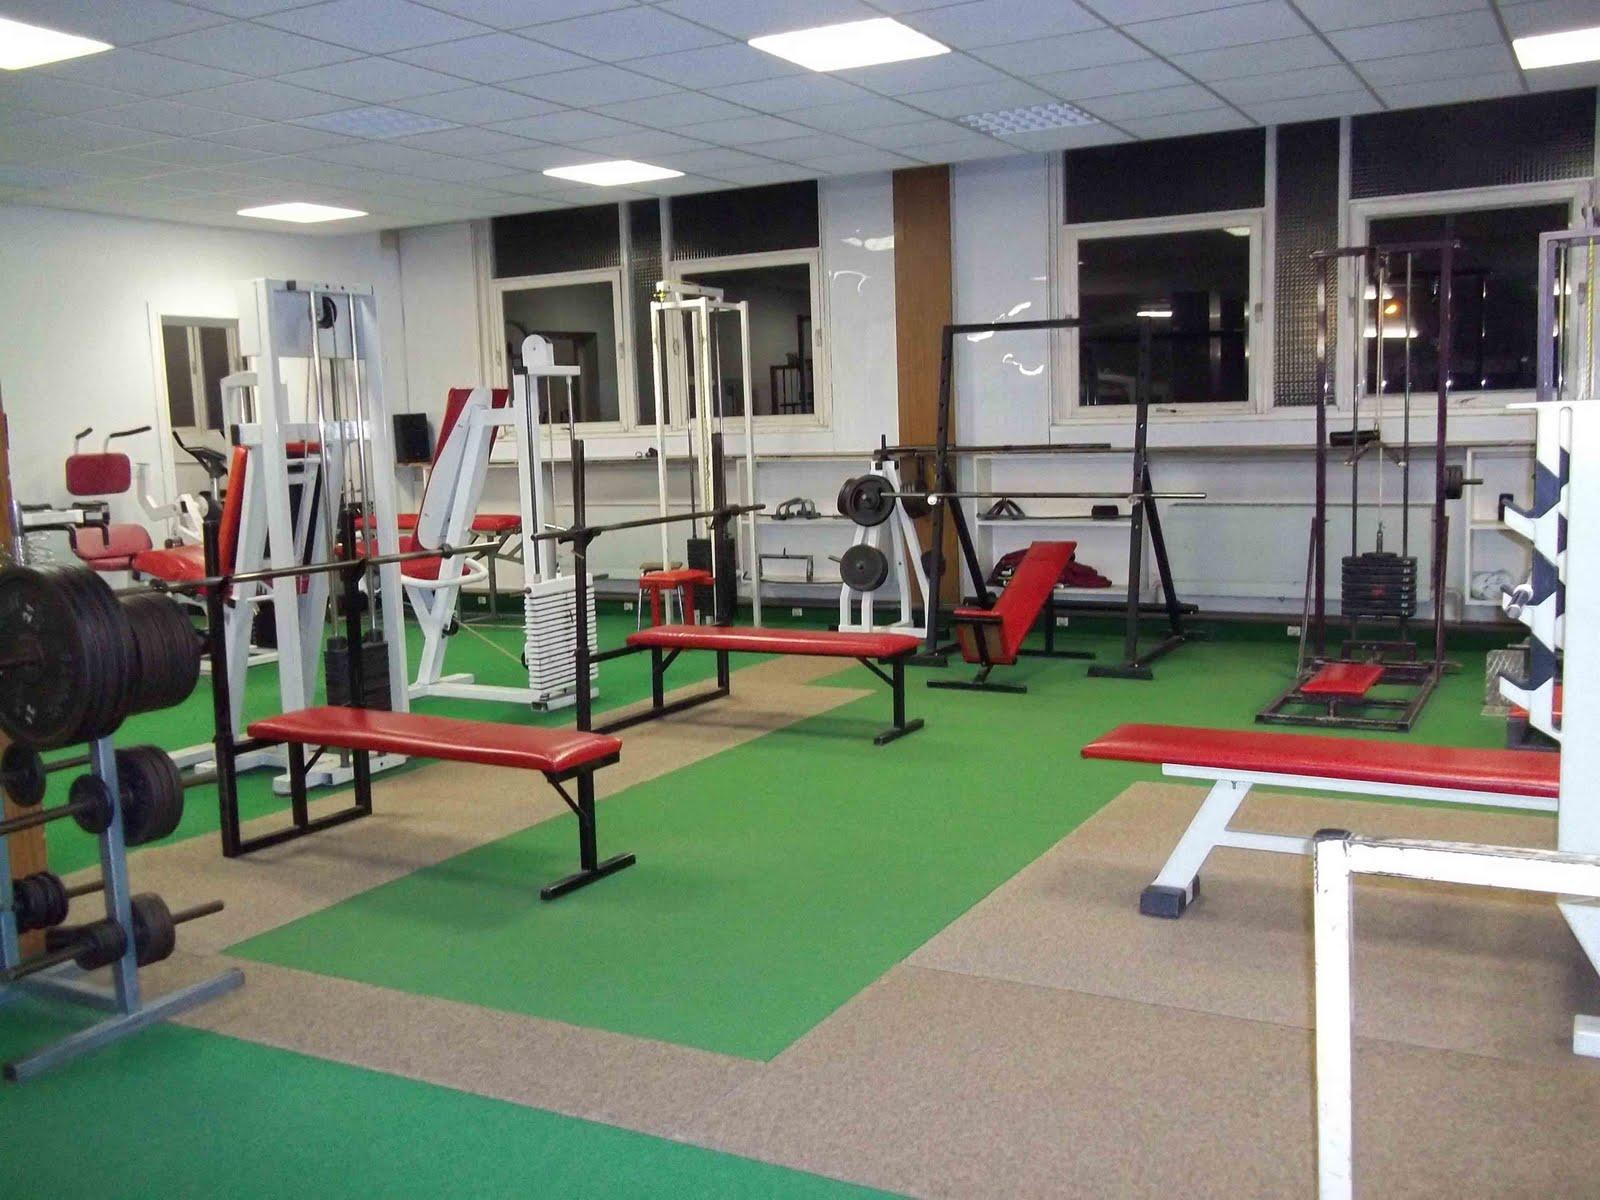 photos du club de fitness musculation montfermeil gagny espace forme montfermeil gagny